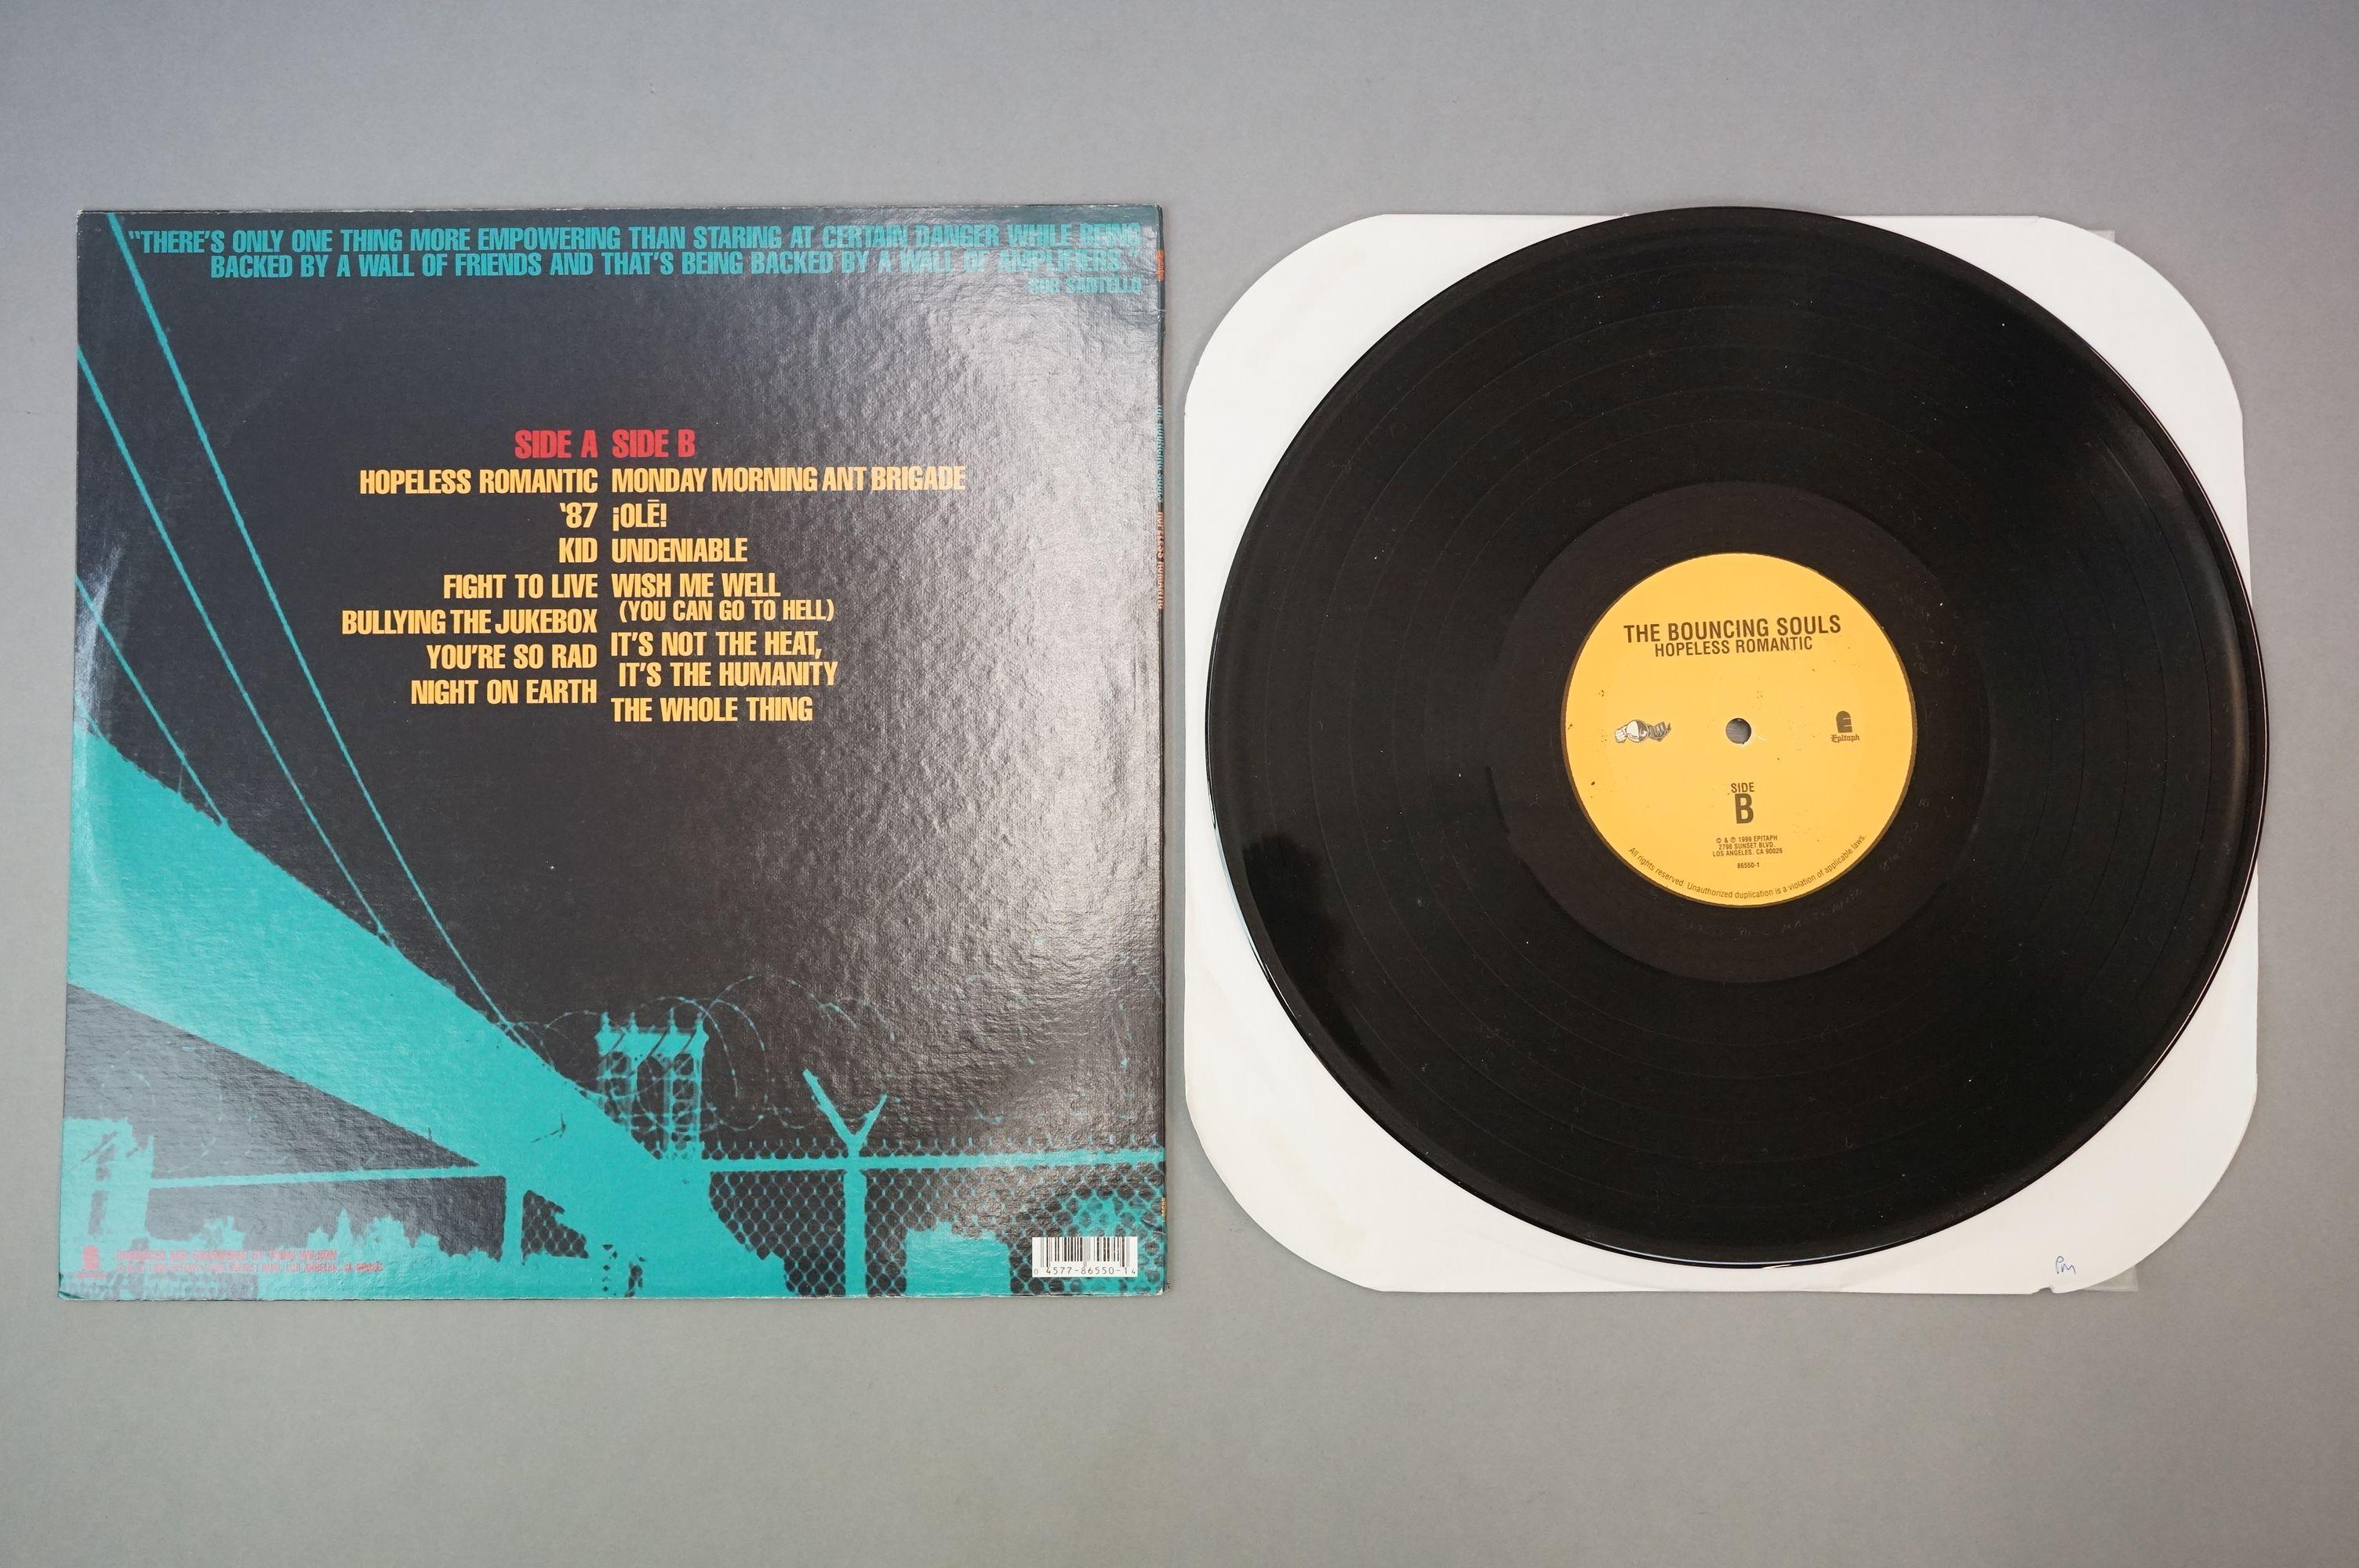 Vinyl - Fleetwood Mac, Kiln House (Reprise RSLP 9004) insert included, sleeve, insert and vinyl vg+ - Image 8 of 14